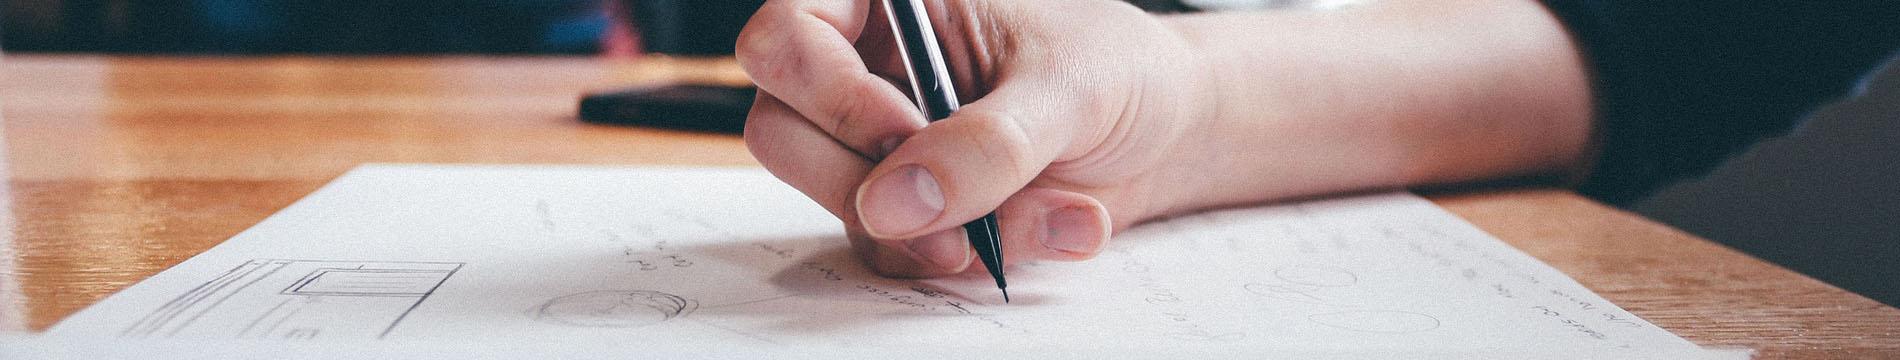 Pro affirmative action essays